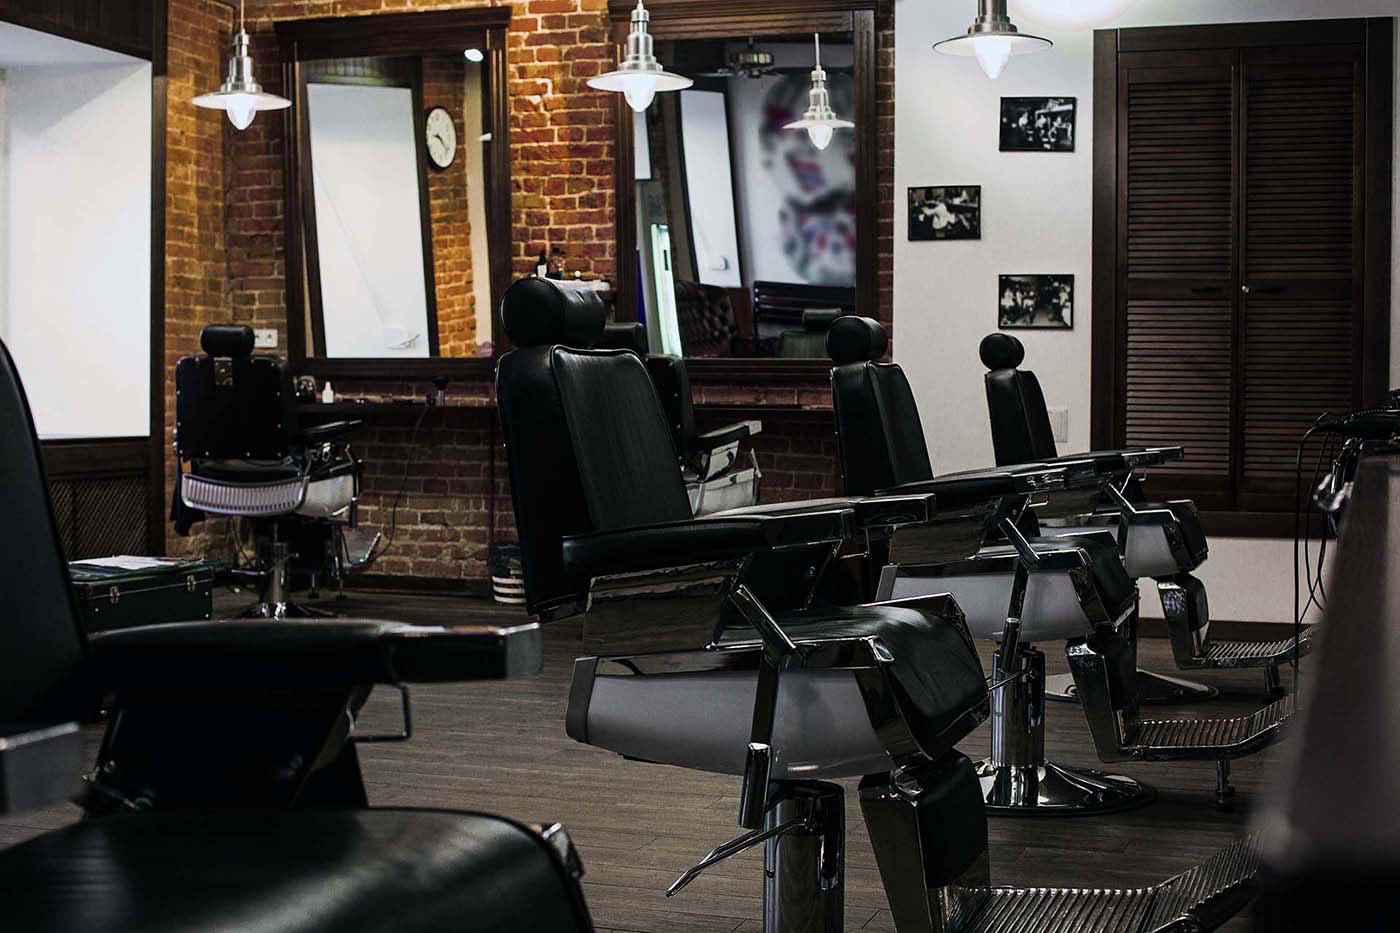 erp distribucion venta productos peluqueria estetica